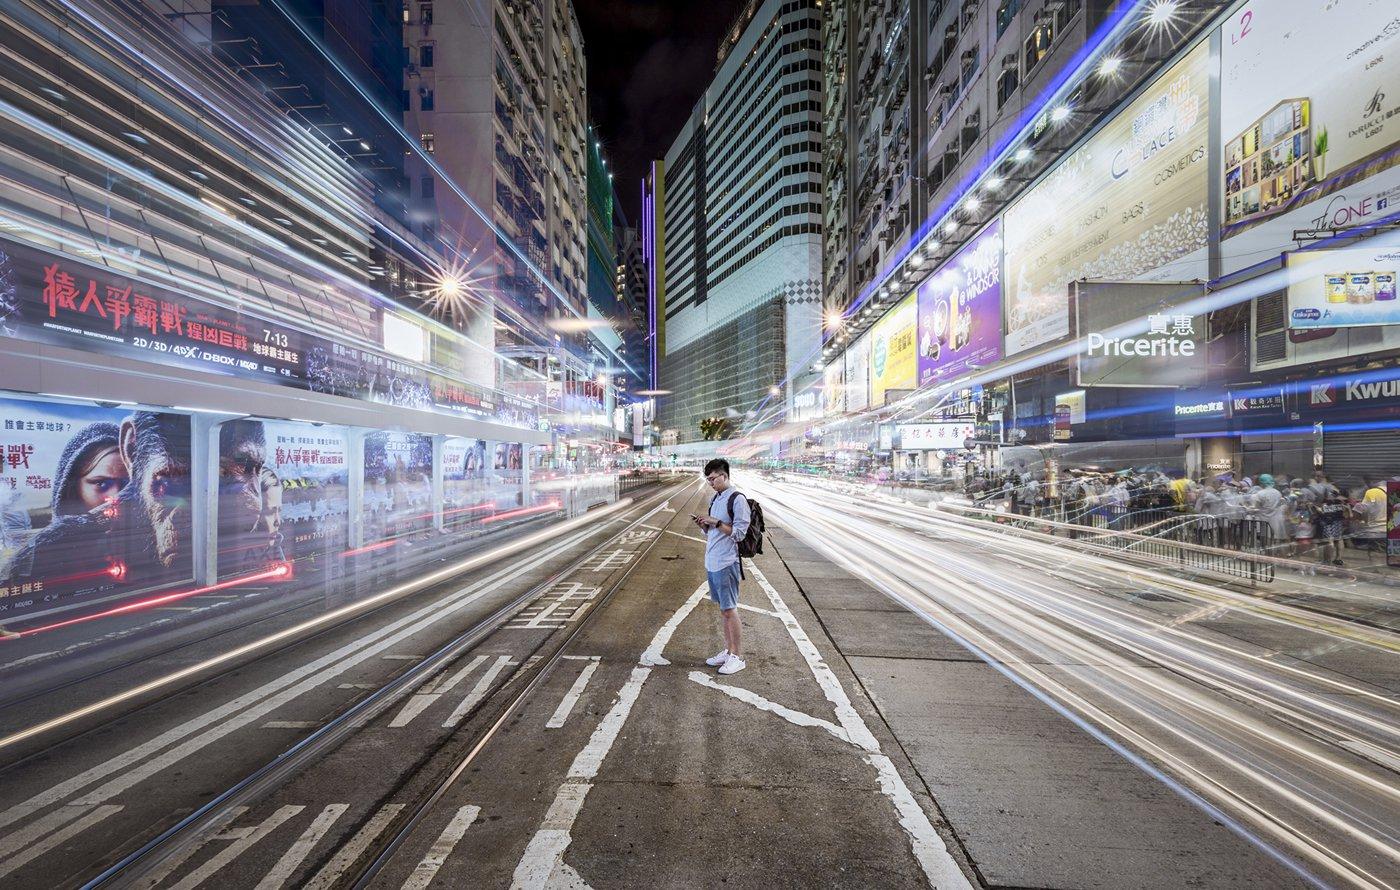 mobility-recasting-society-january2019.jpg